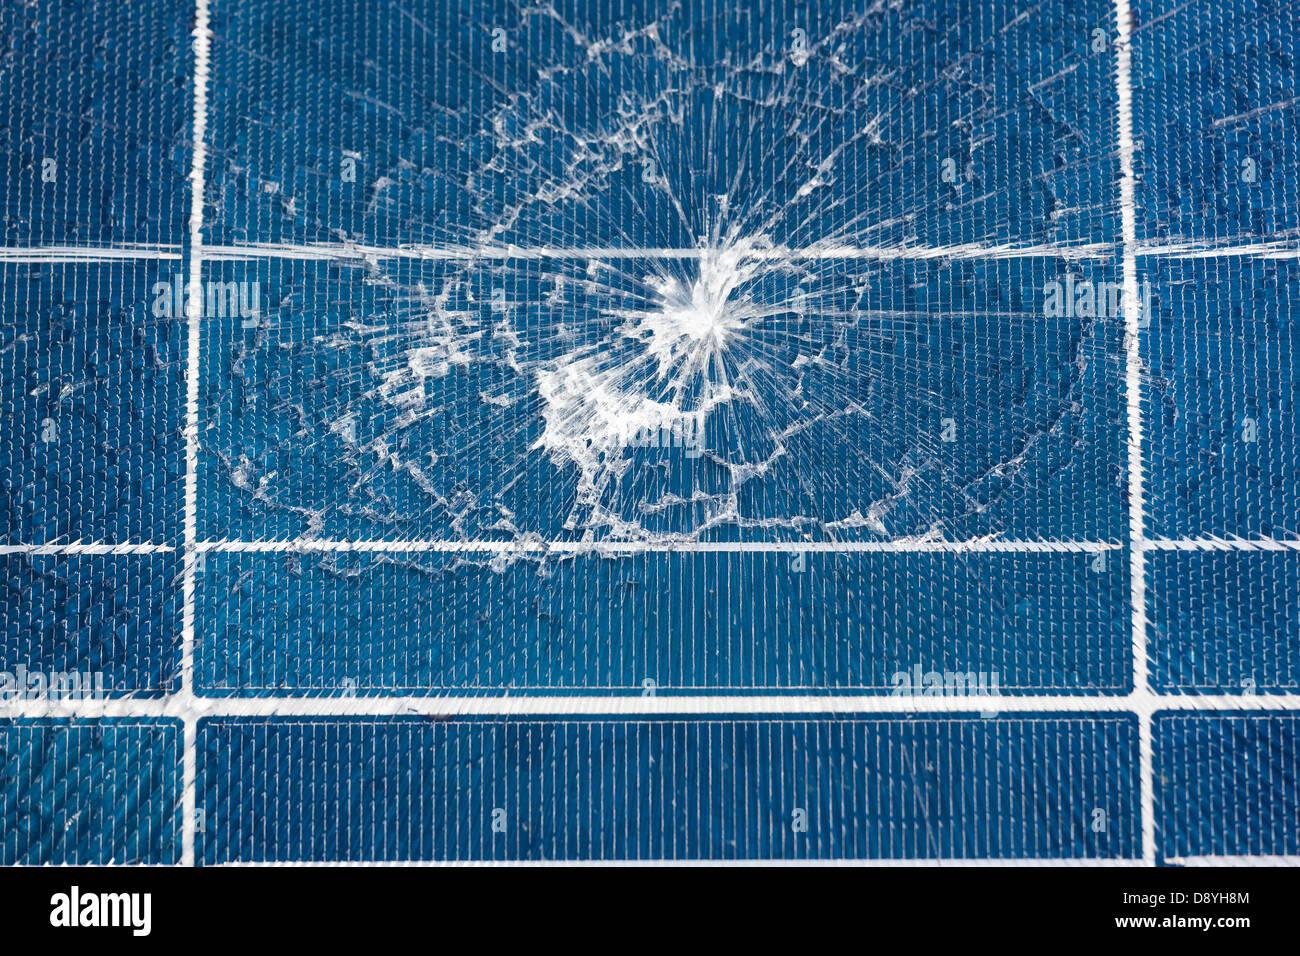 Damaged Chinese Solar Panel Broken Due To Impact